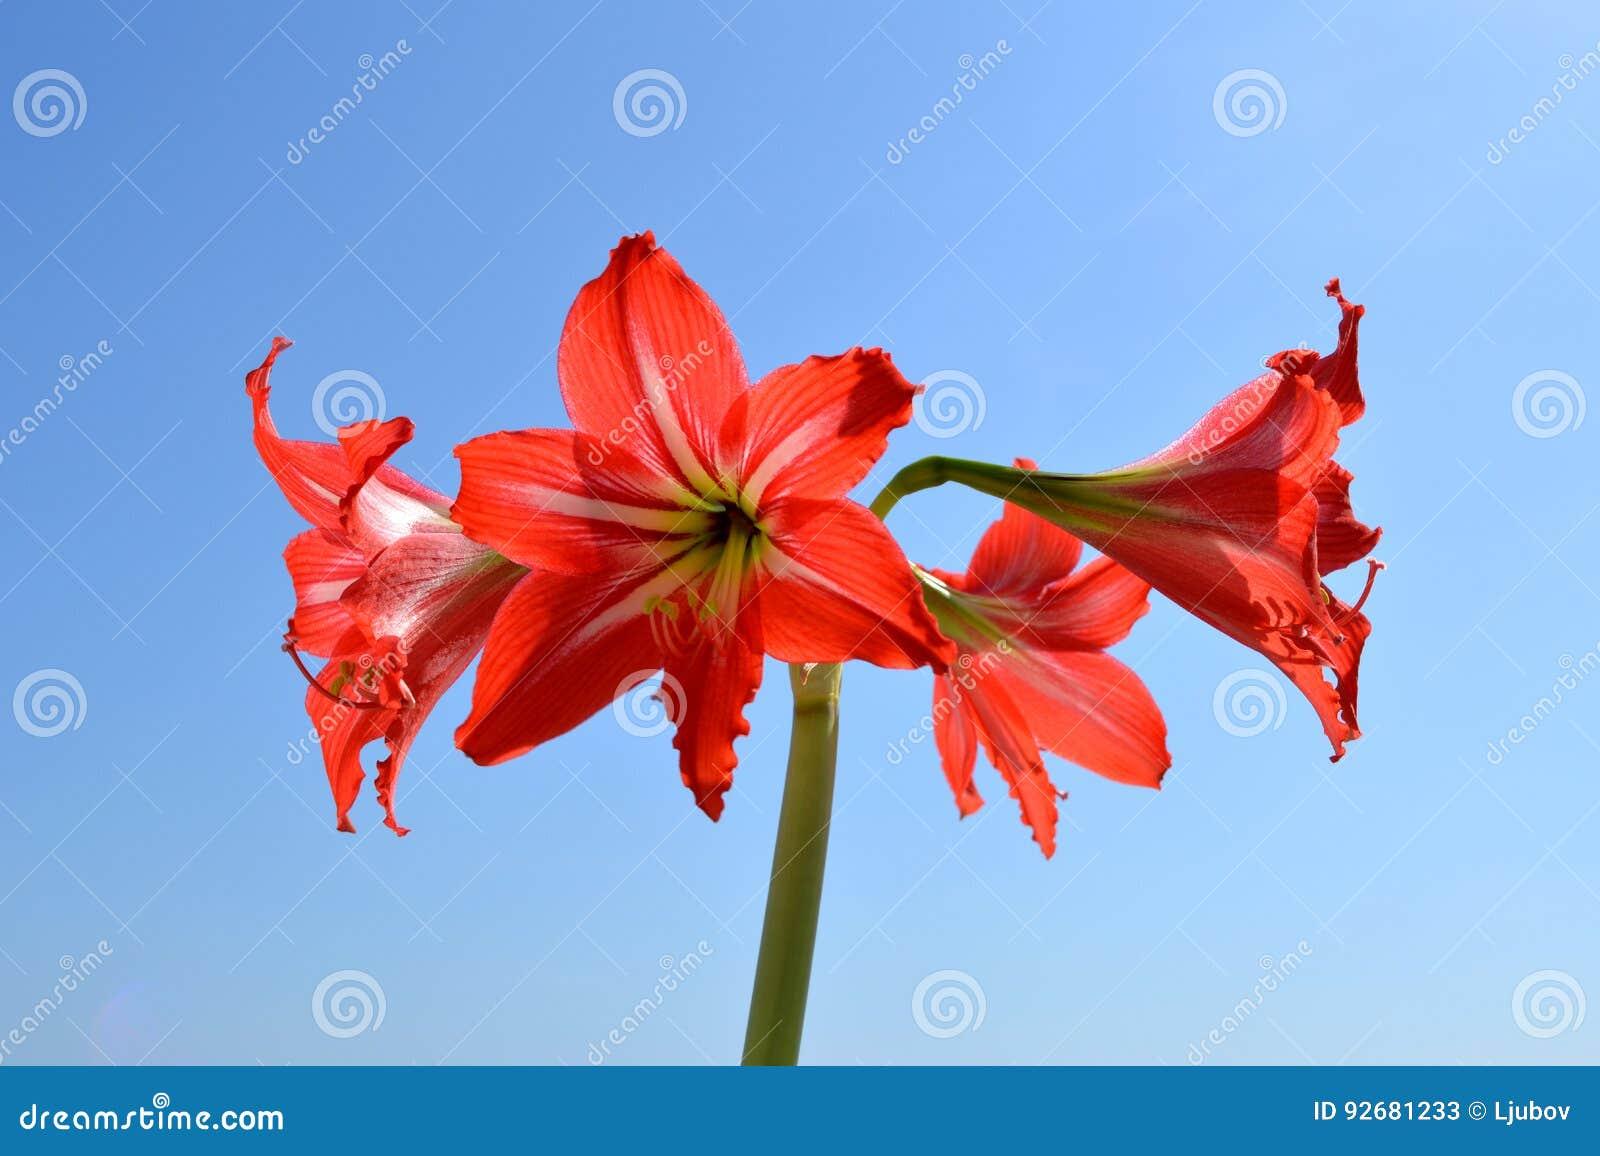 Amaryllis Hippeastrum. Beautiful Red Flowers Against Blue Sky Stock ...